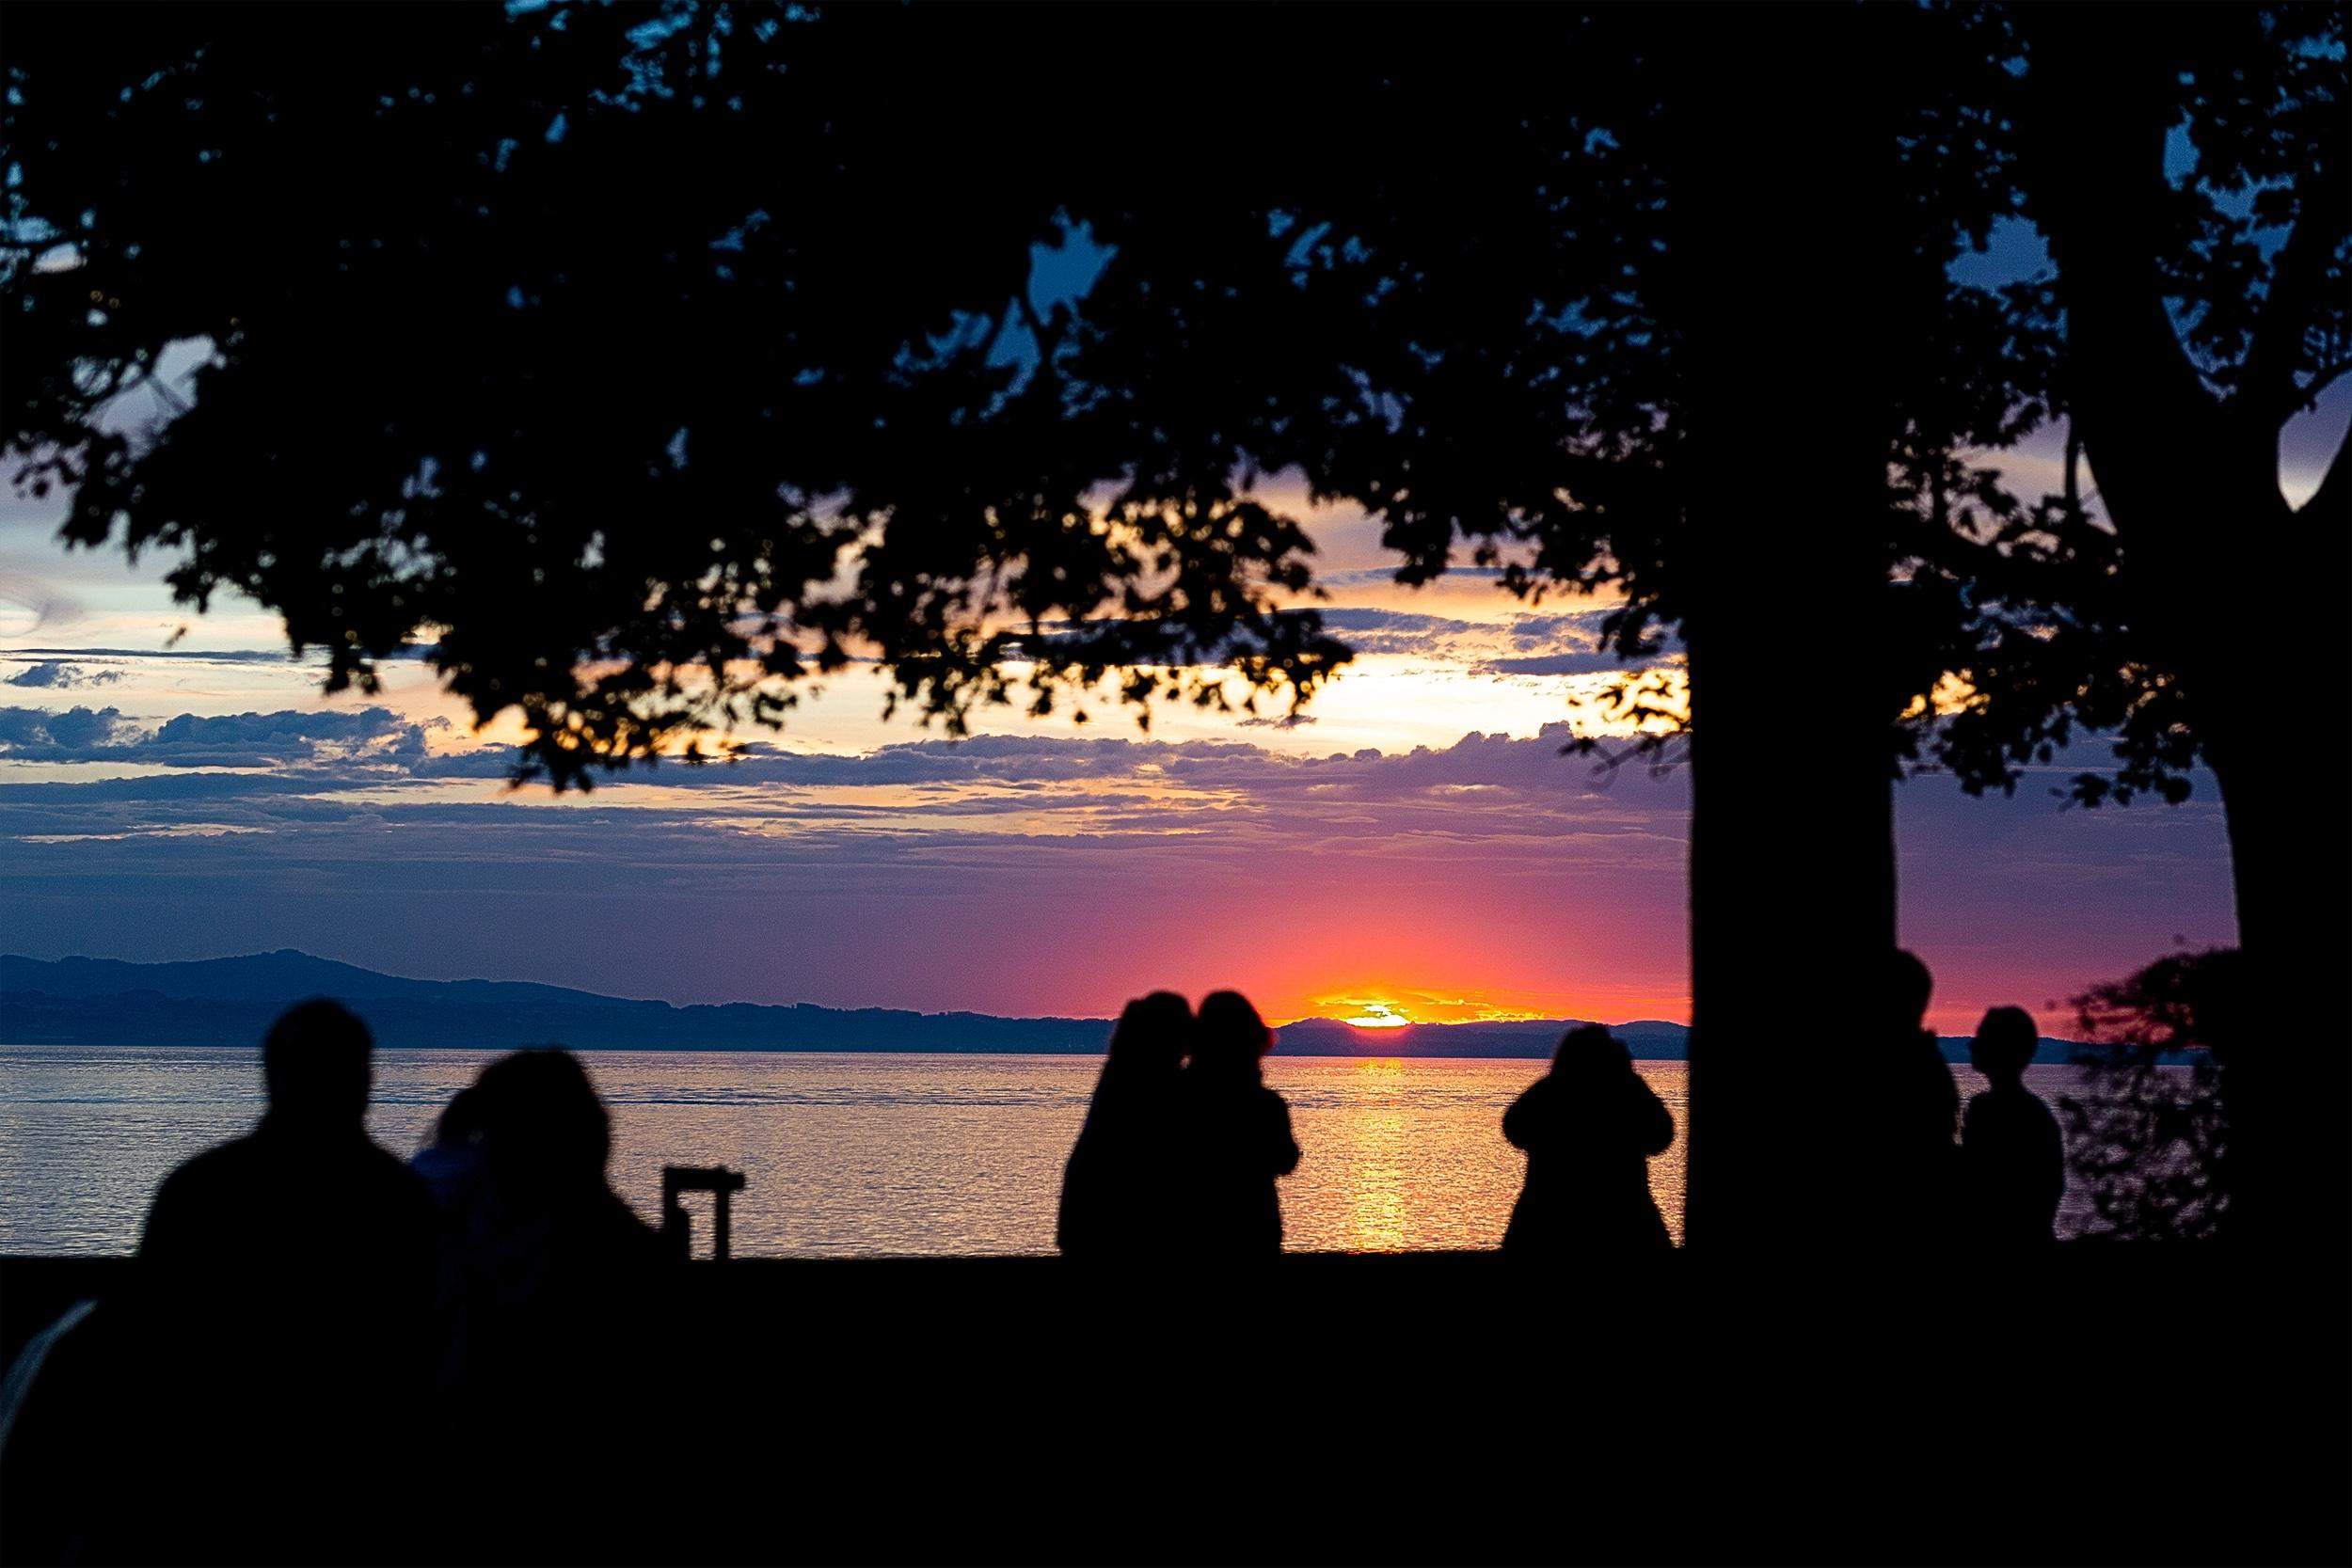 Sonnenuntergang am Bodensee bei Lindau.